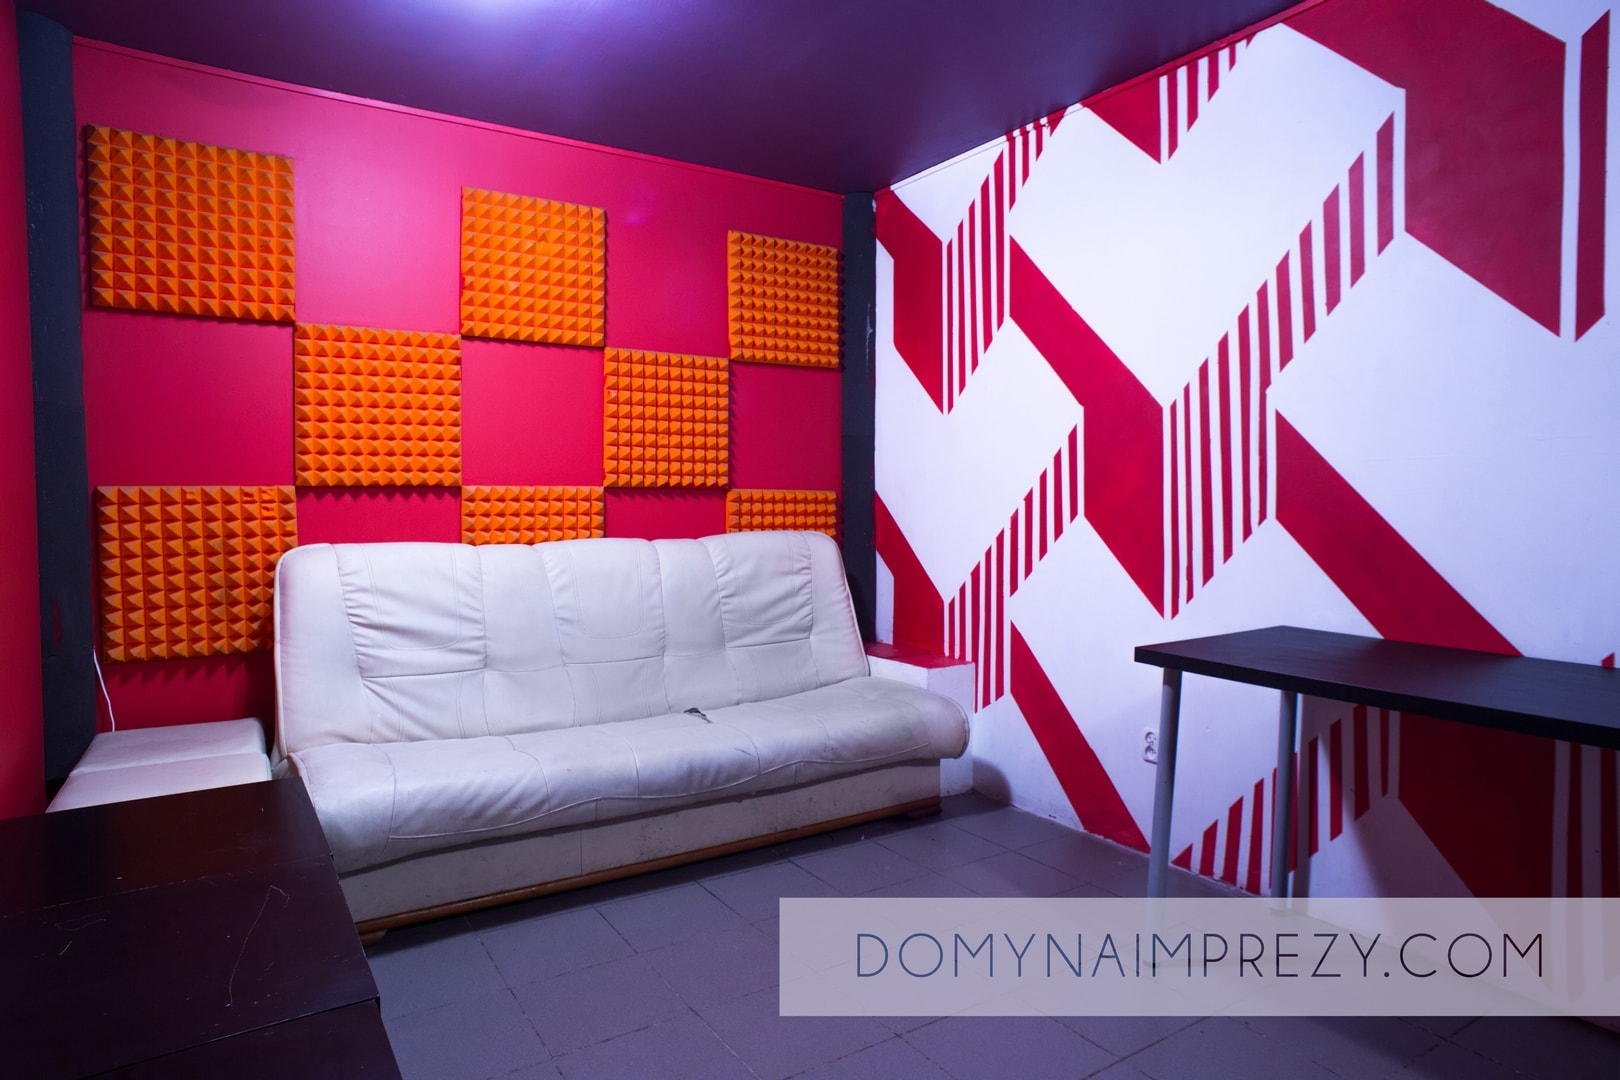 Kanapa i stolik w Studio Bemowo podczas imprezy